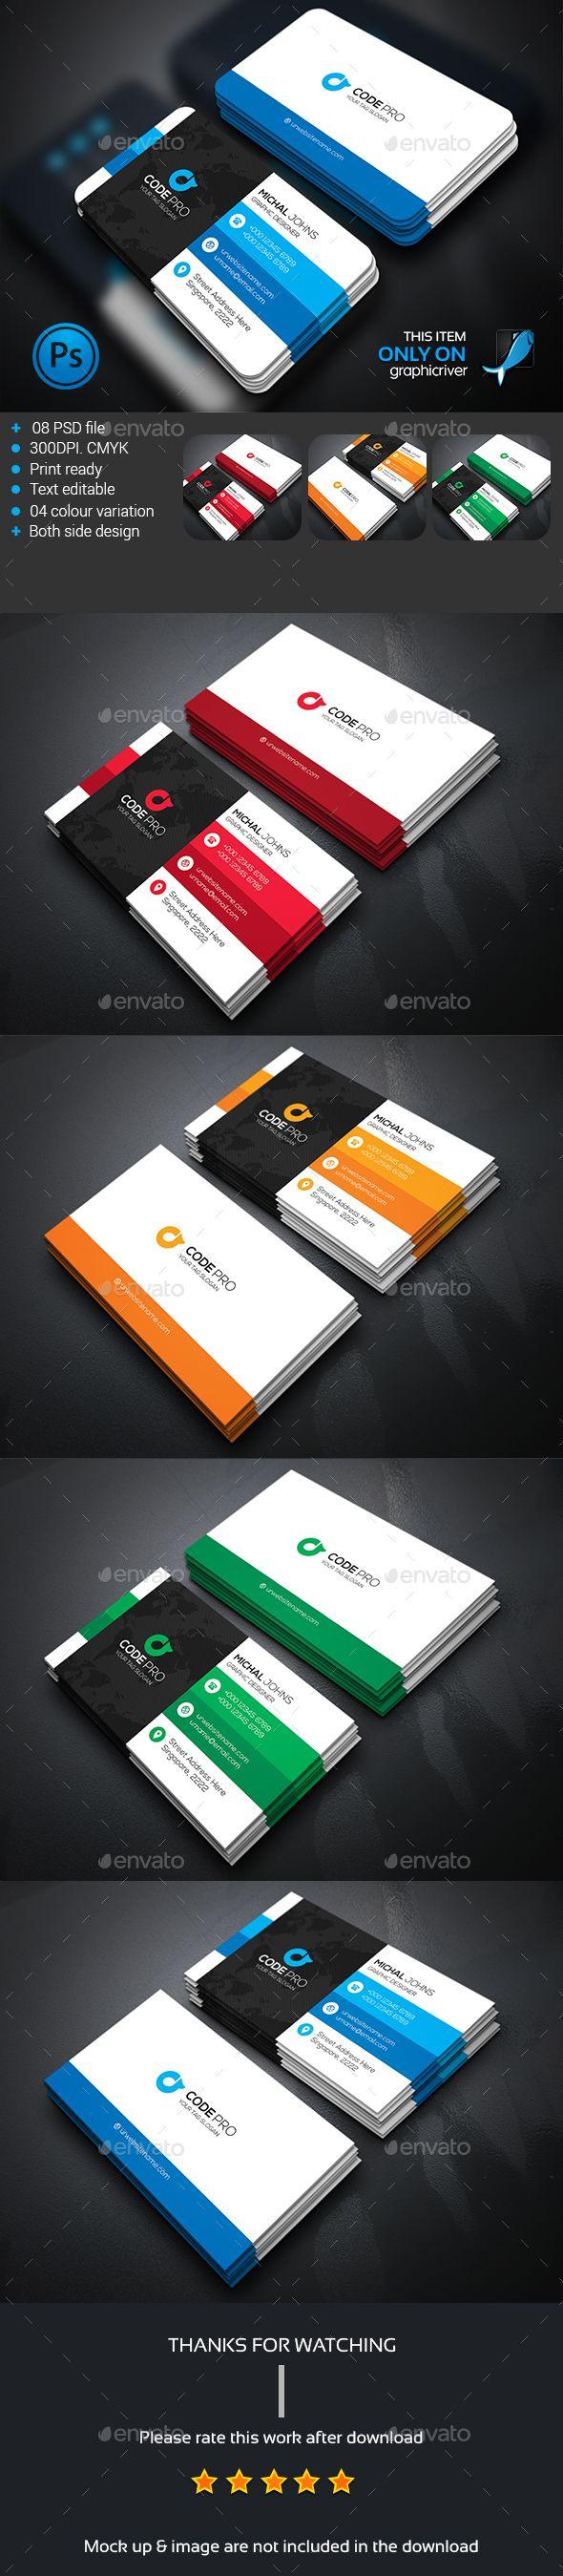 Mega Corporate Business card Template PSD #design Download: http://graphicriver.net/item/mega-corporate-business-card/13683109?ref=ksioks